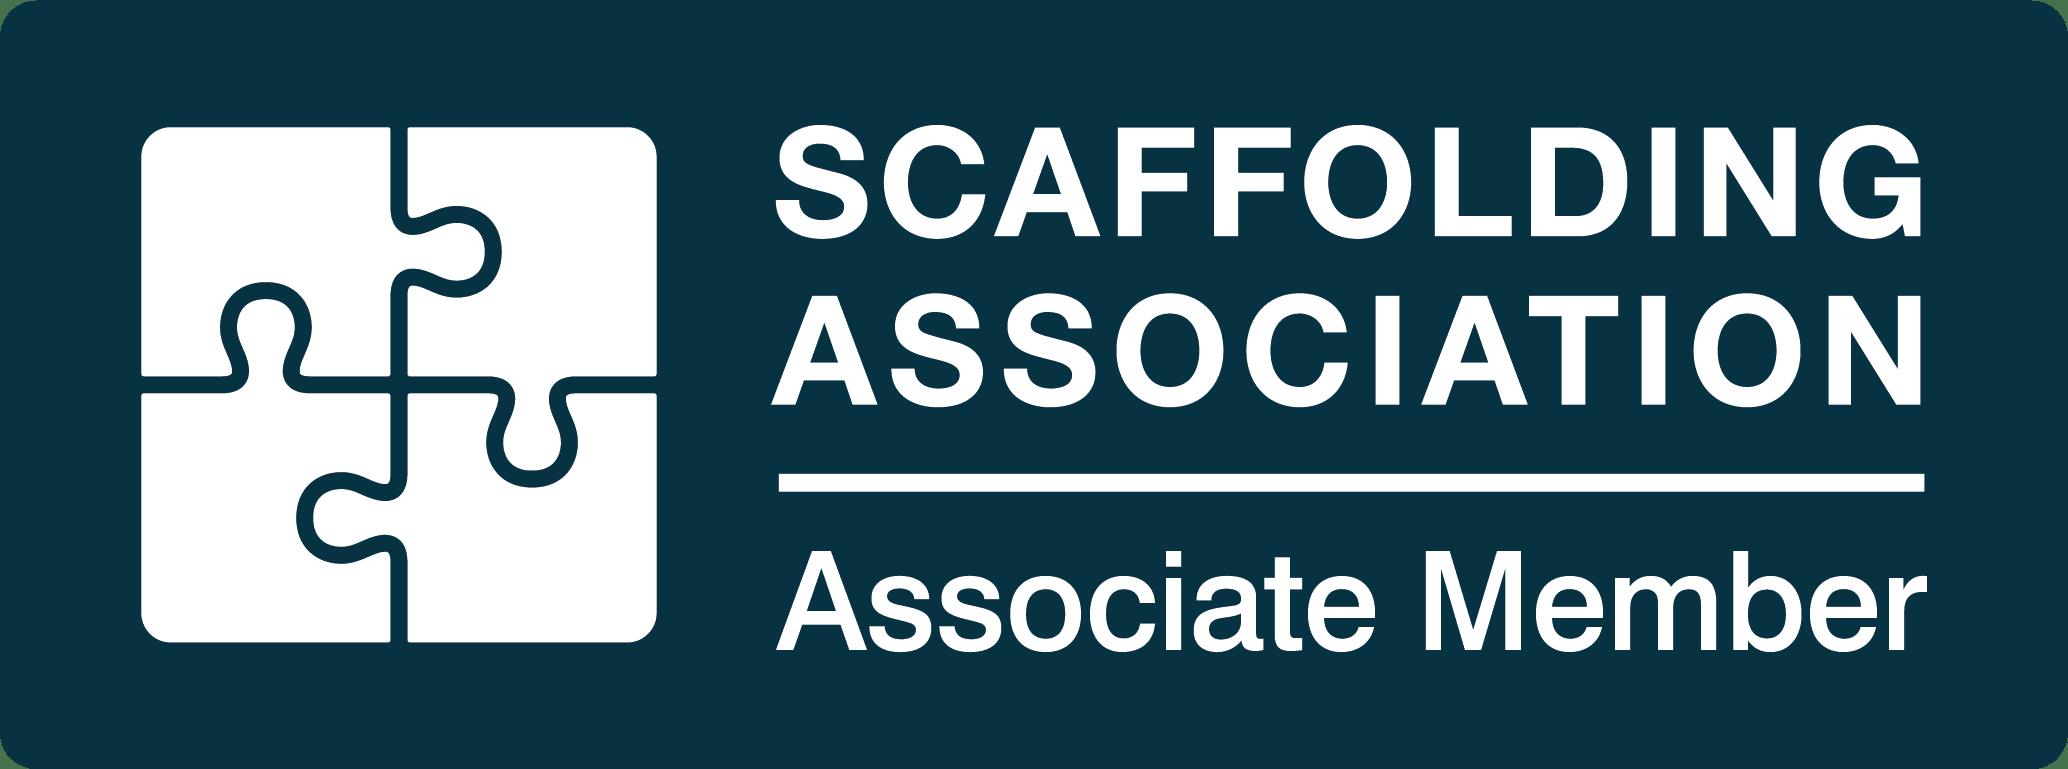 Scaffolding Association logo